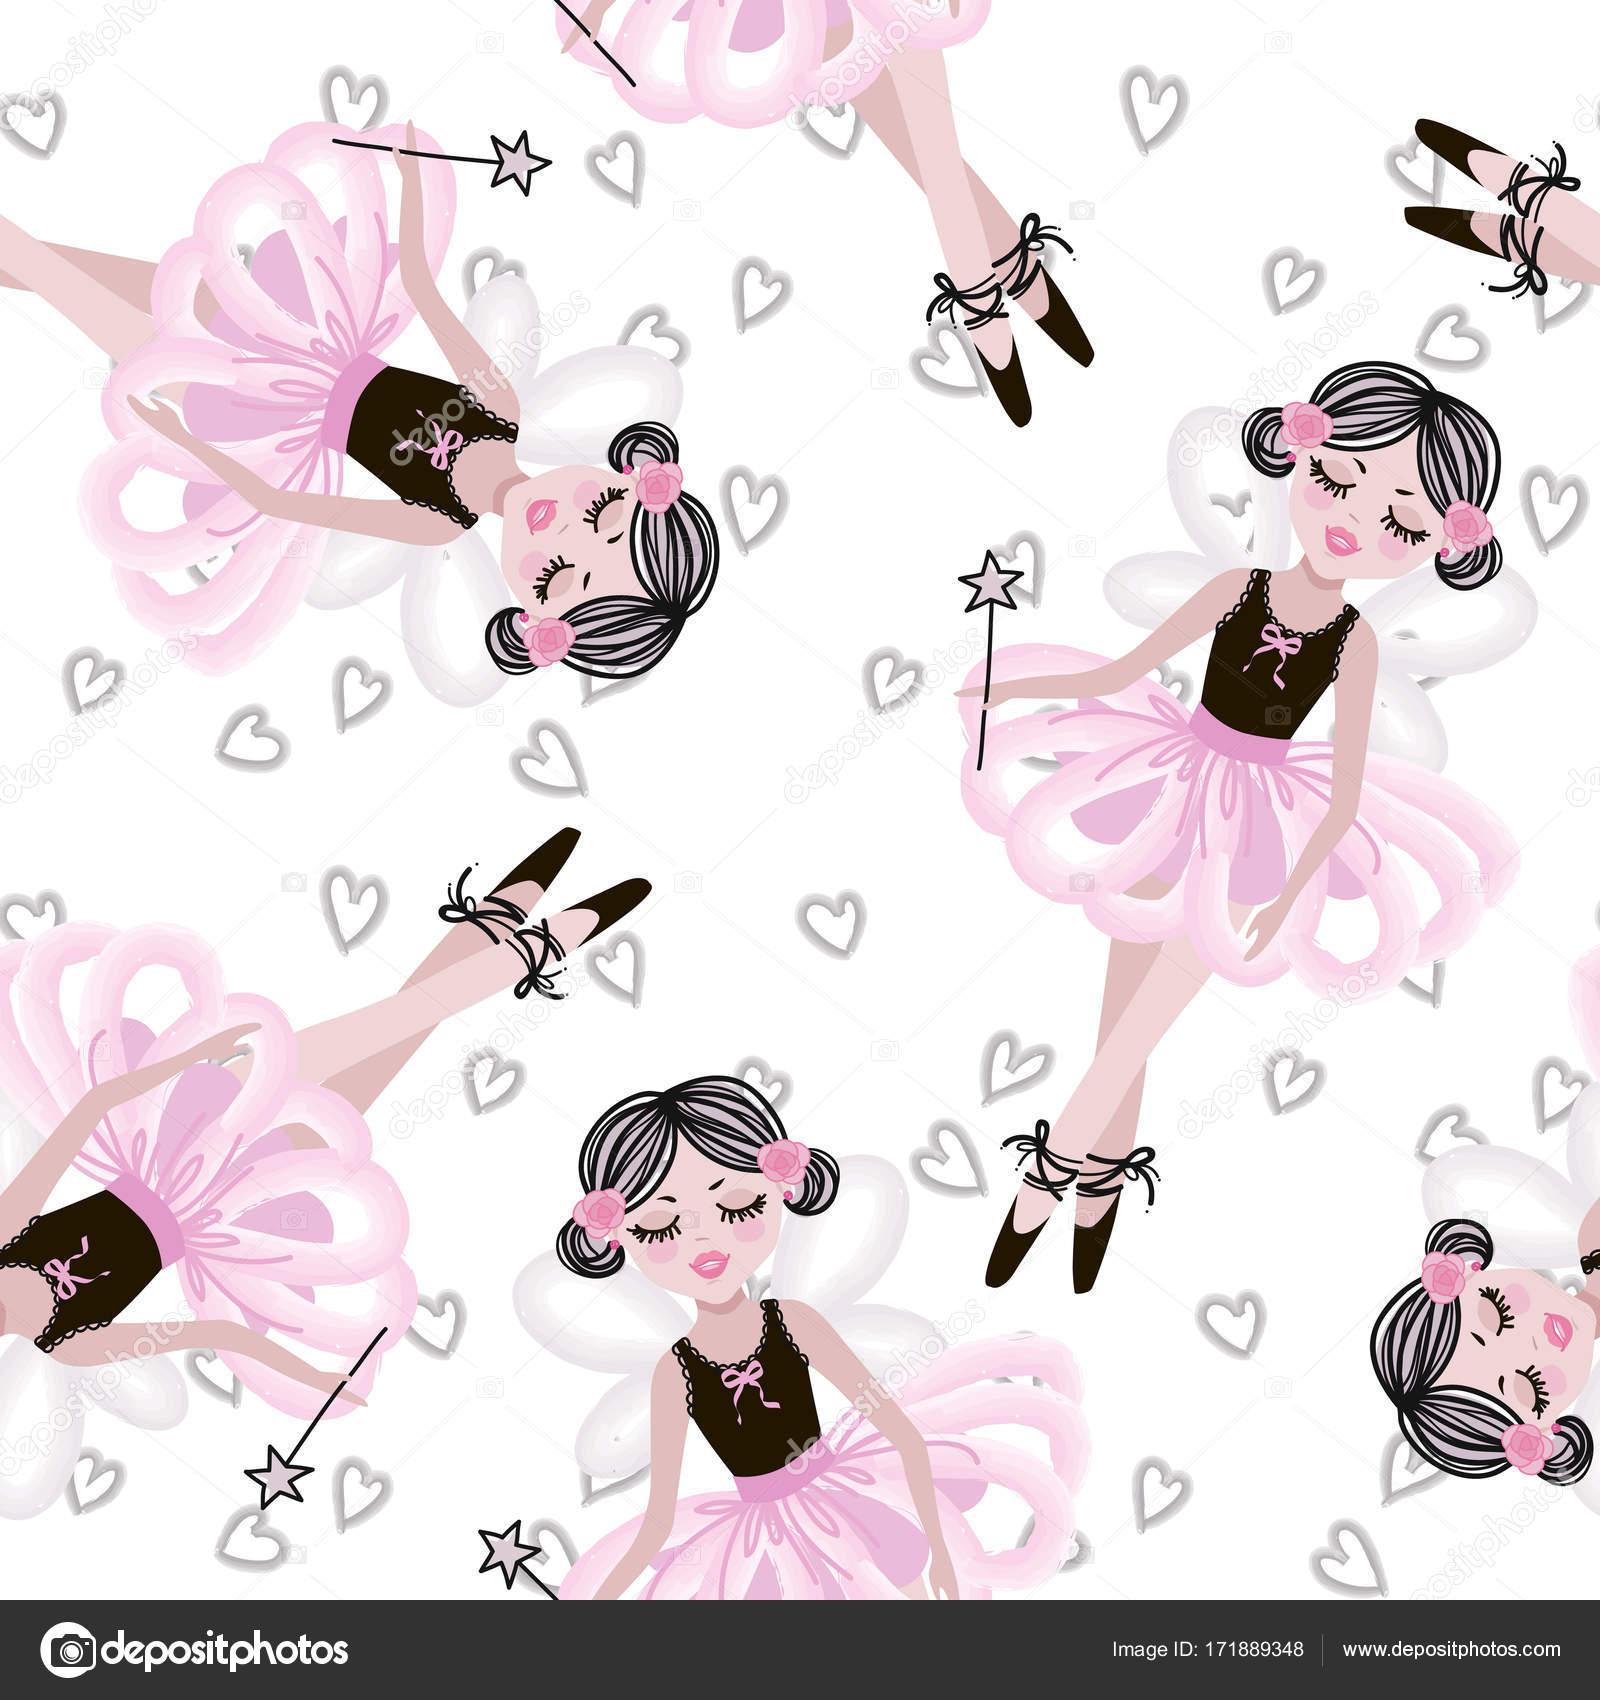 0182aff9c715 Cute Dancing Ballerina Girls Pink Tutus Vector Seamless Pattern Baby ...